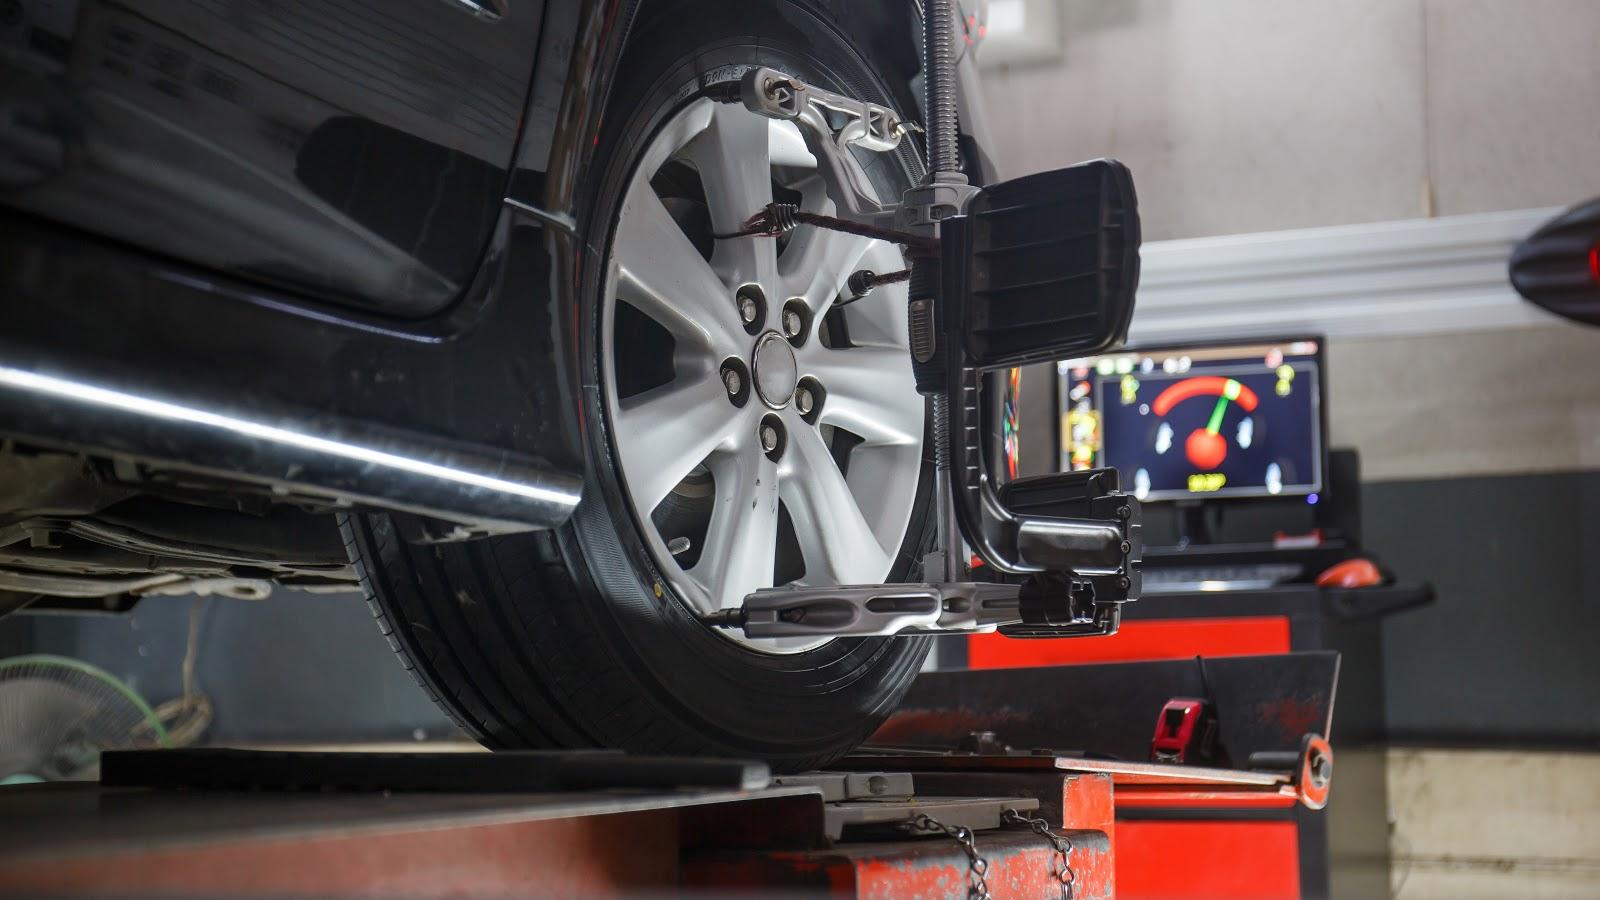 Car going through wheel alignment checks in a professional garage.